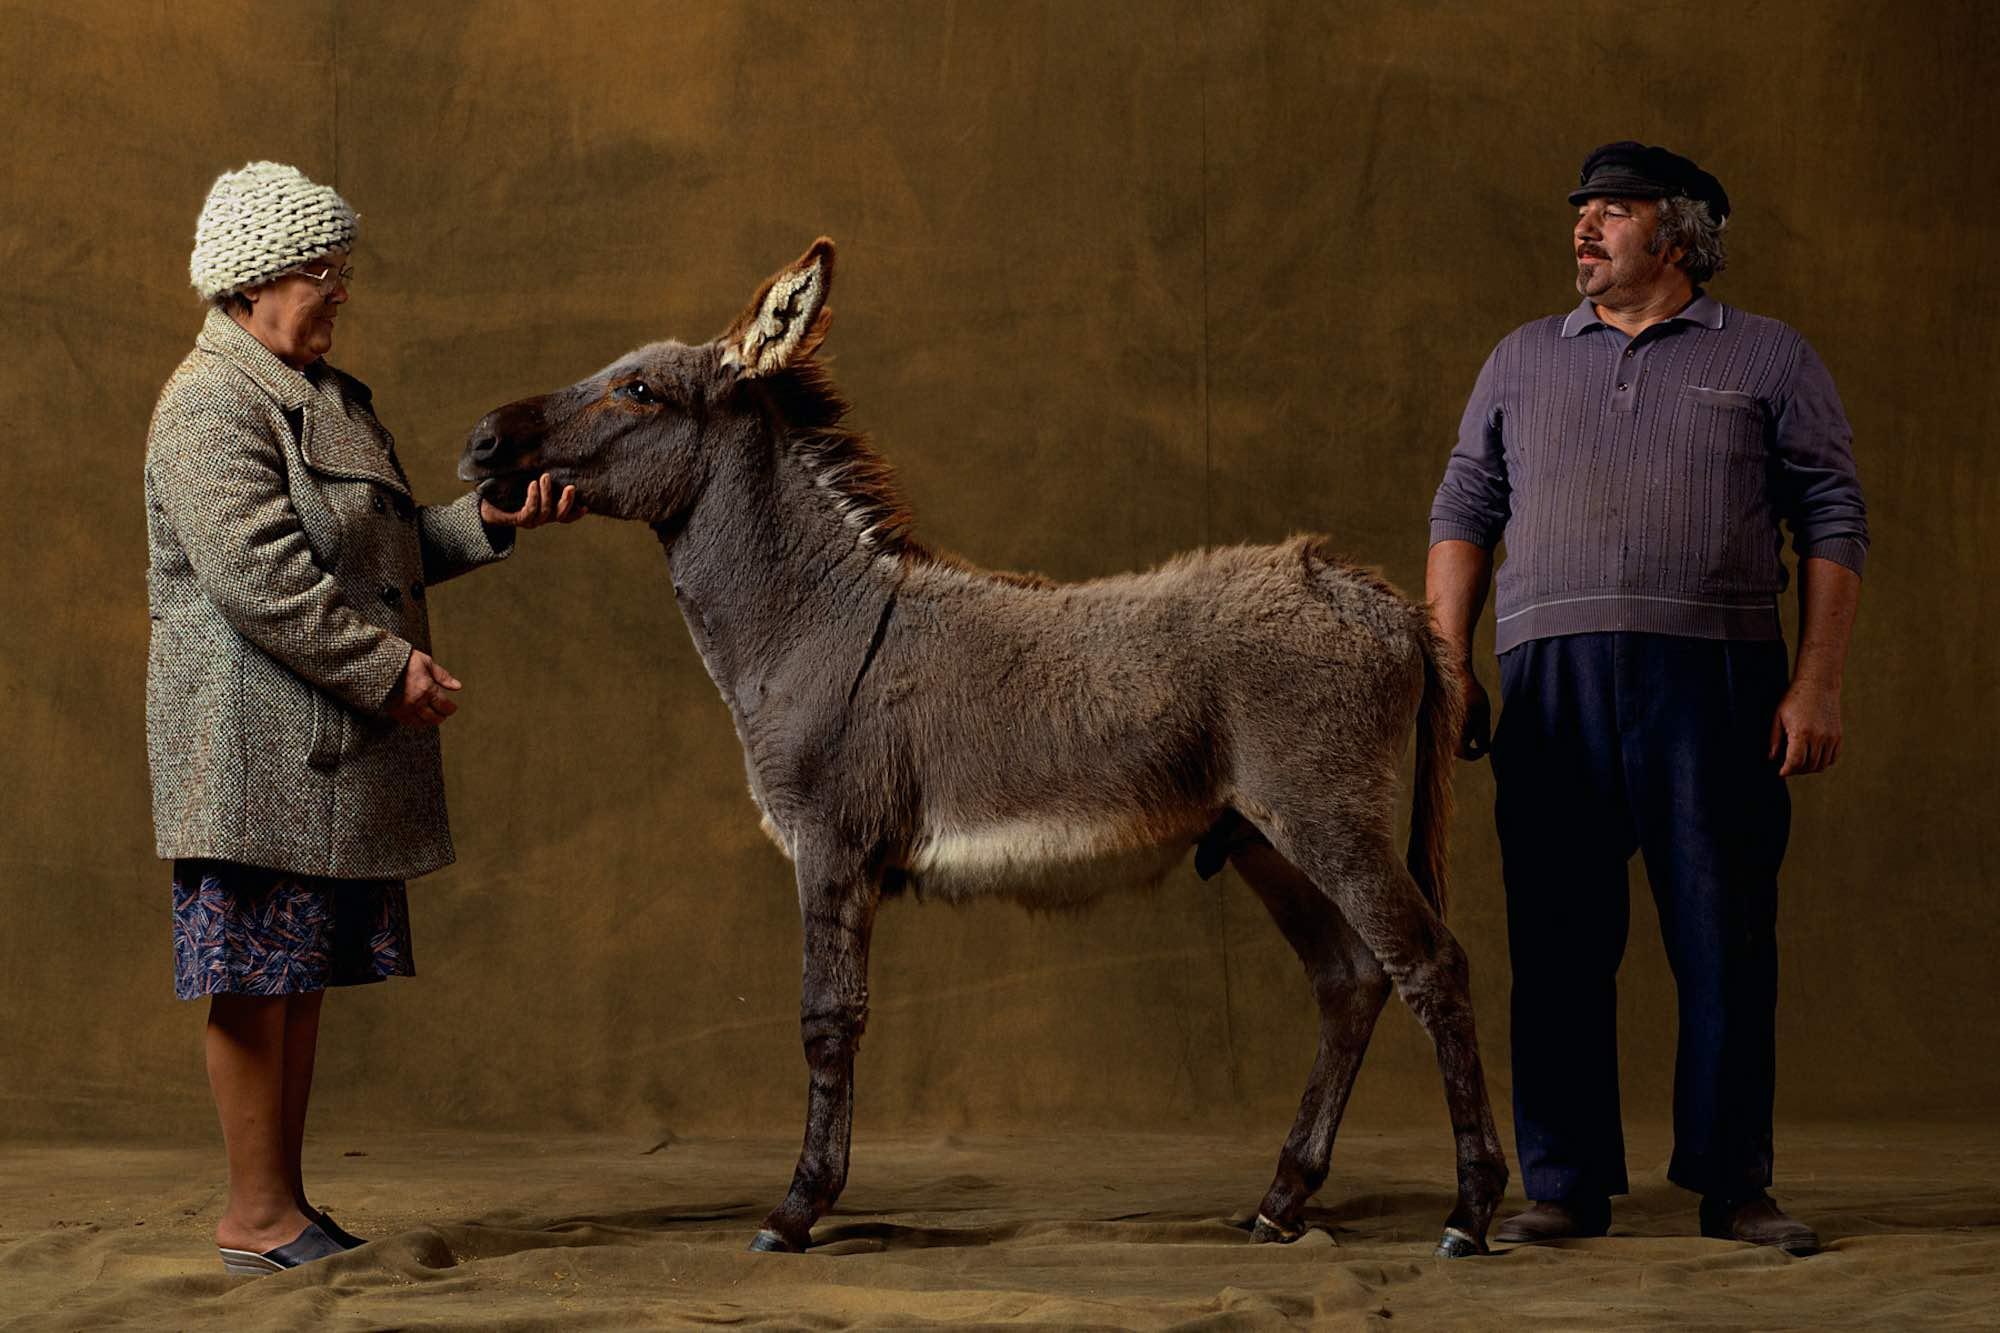 Provencal donkey - Yann Arthus-Bertrand